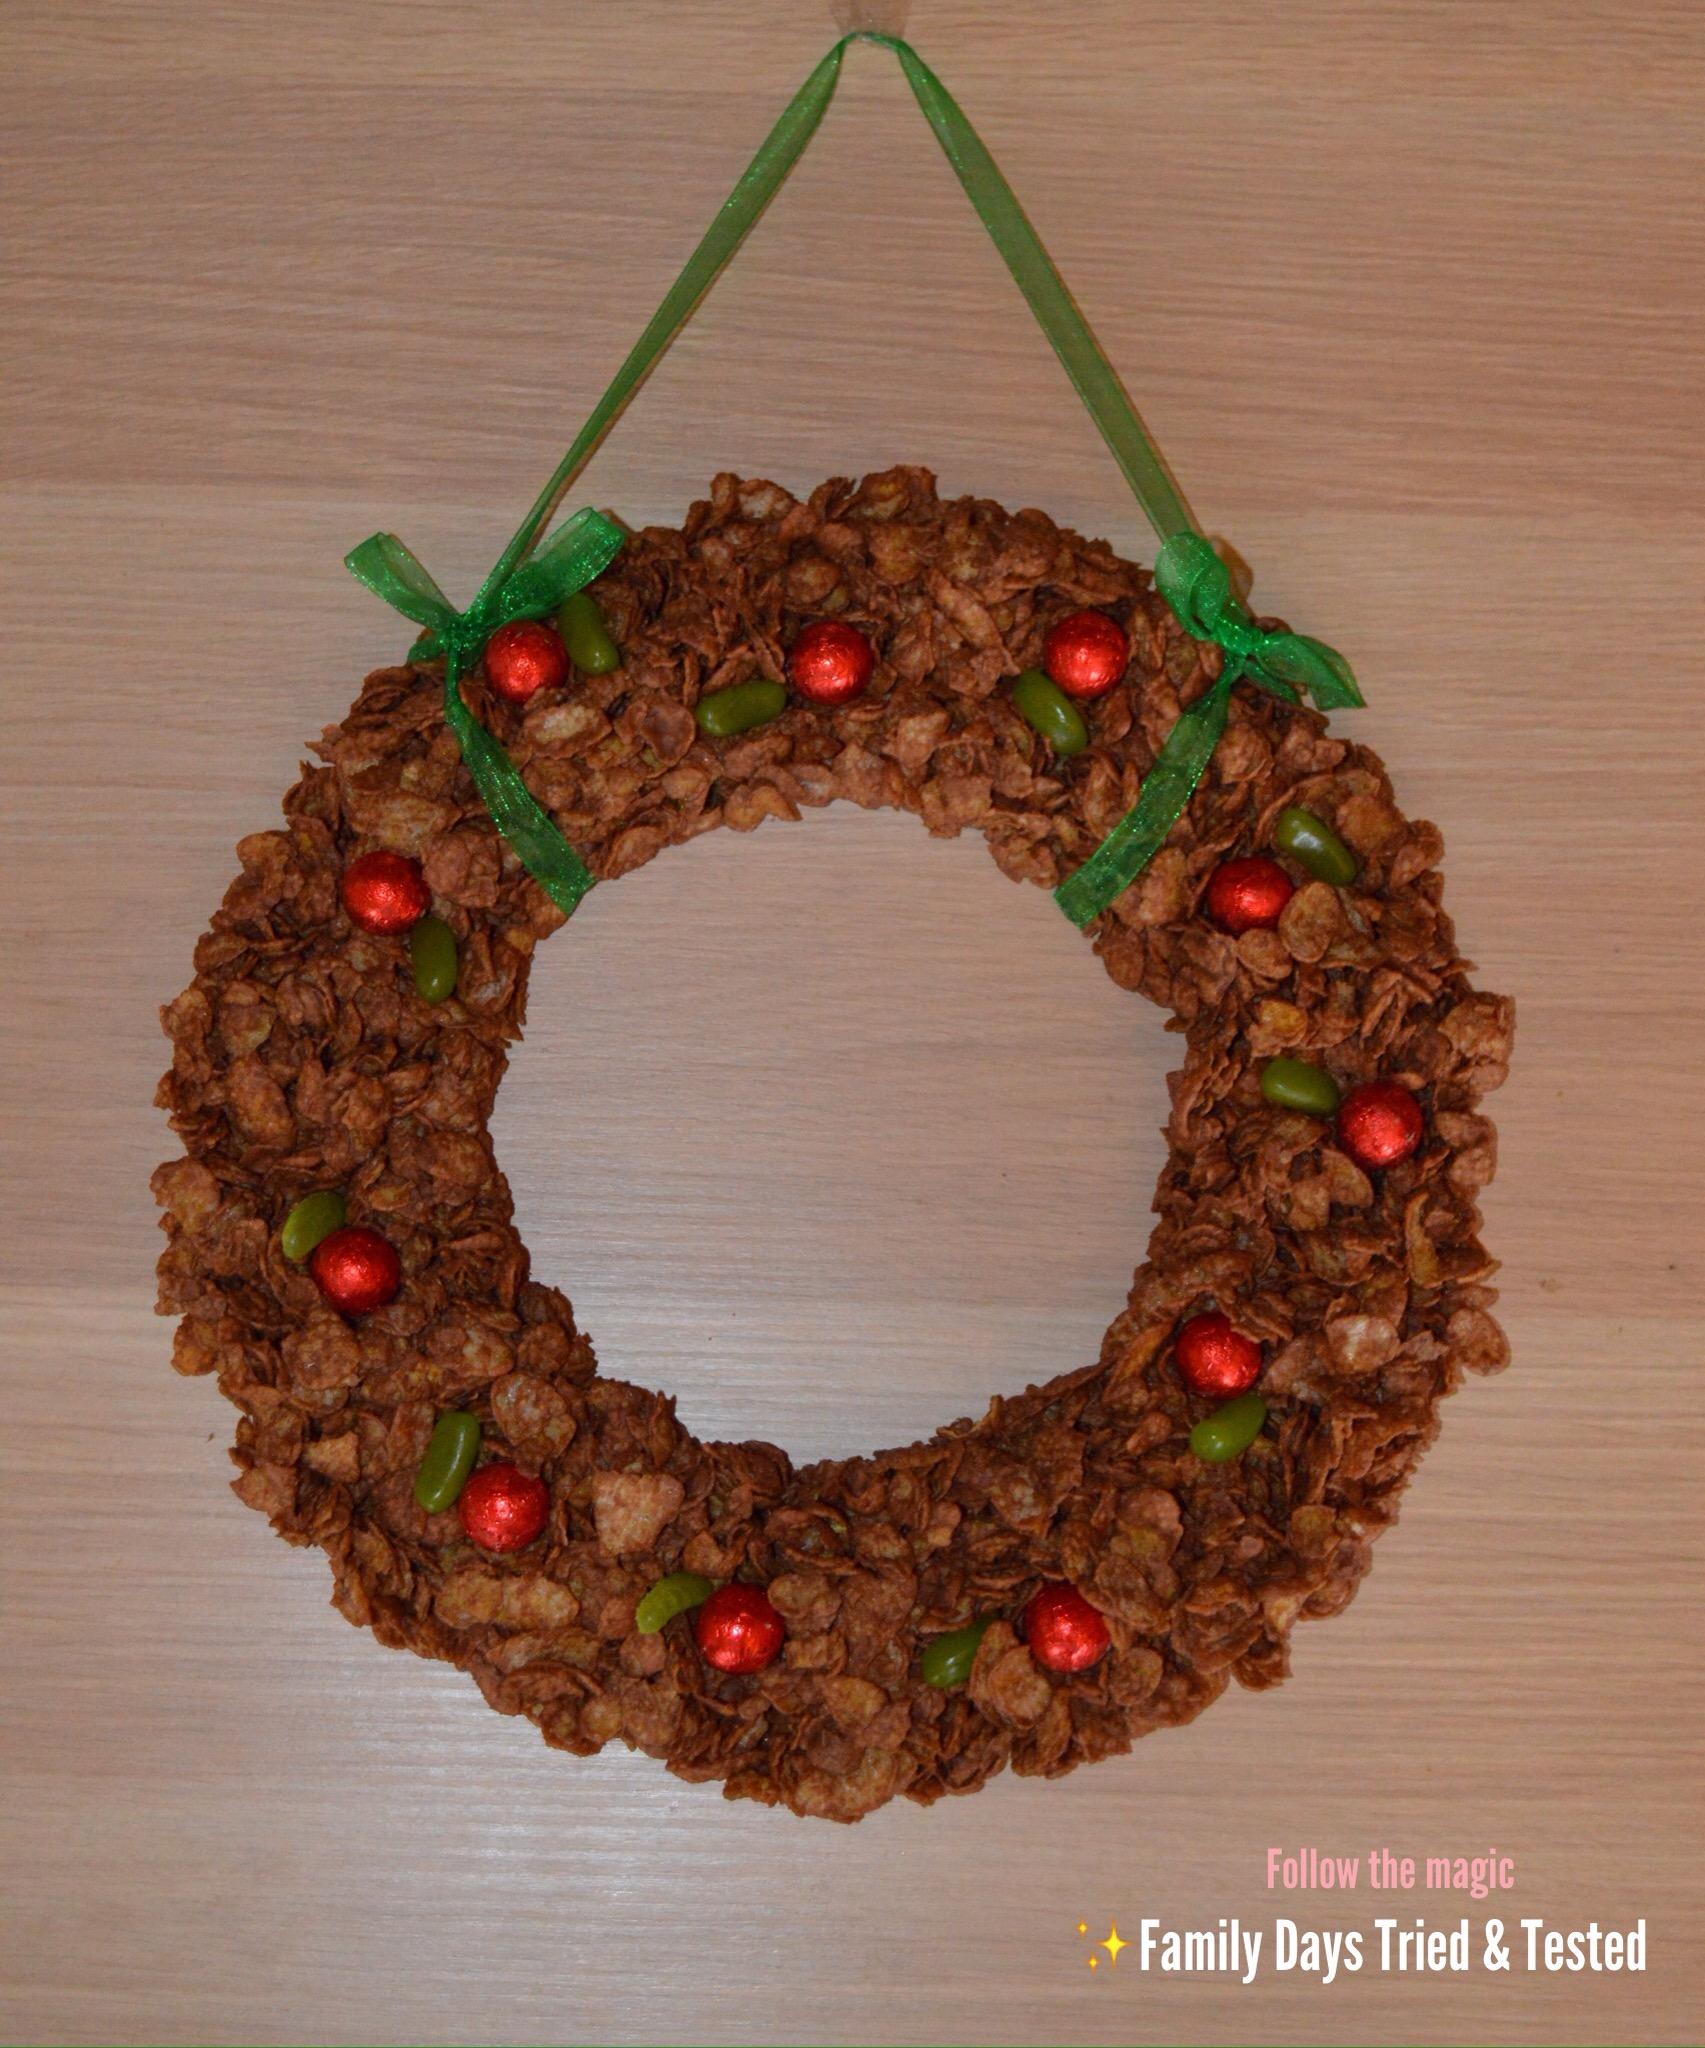 Chocolate Crispy Cake Festive Wreath